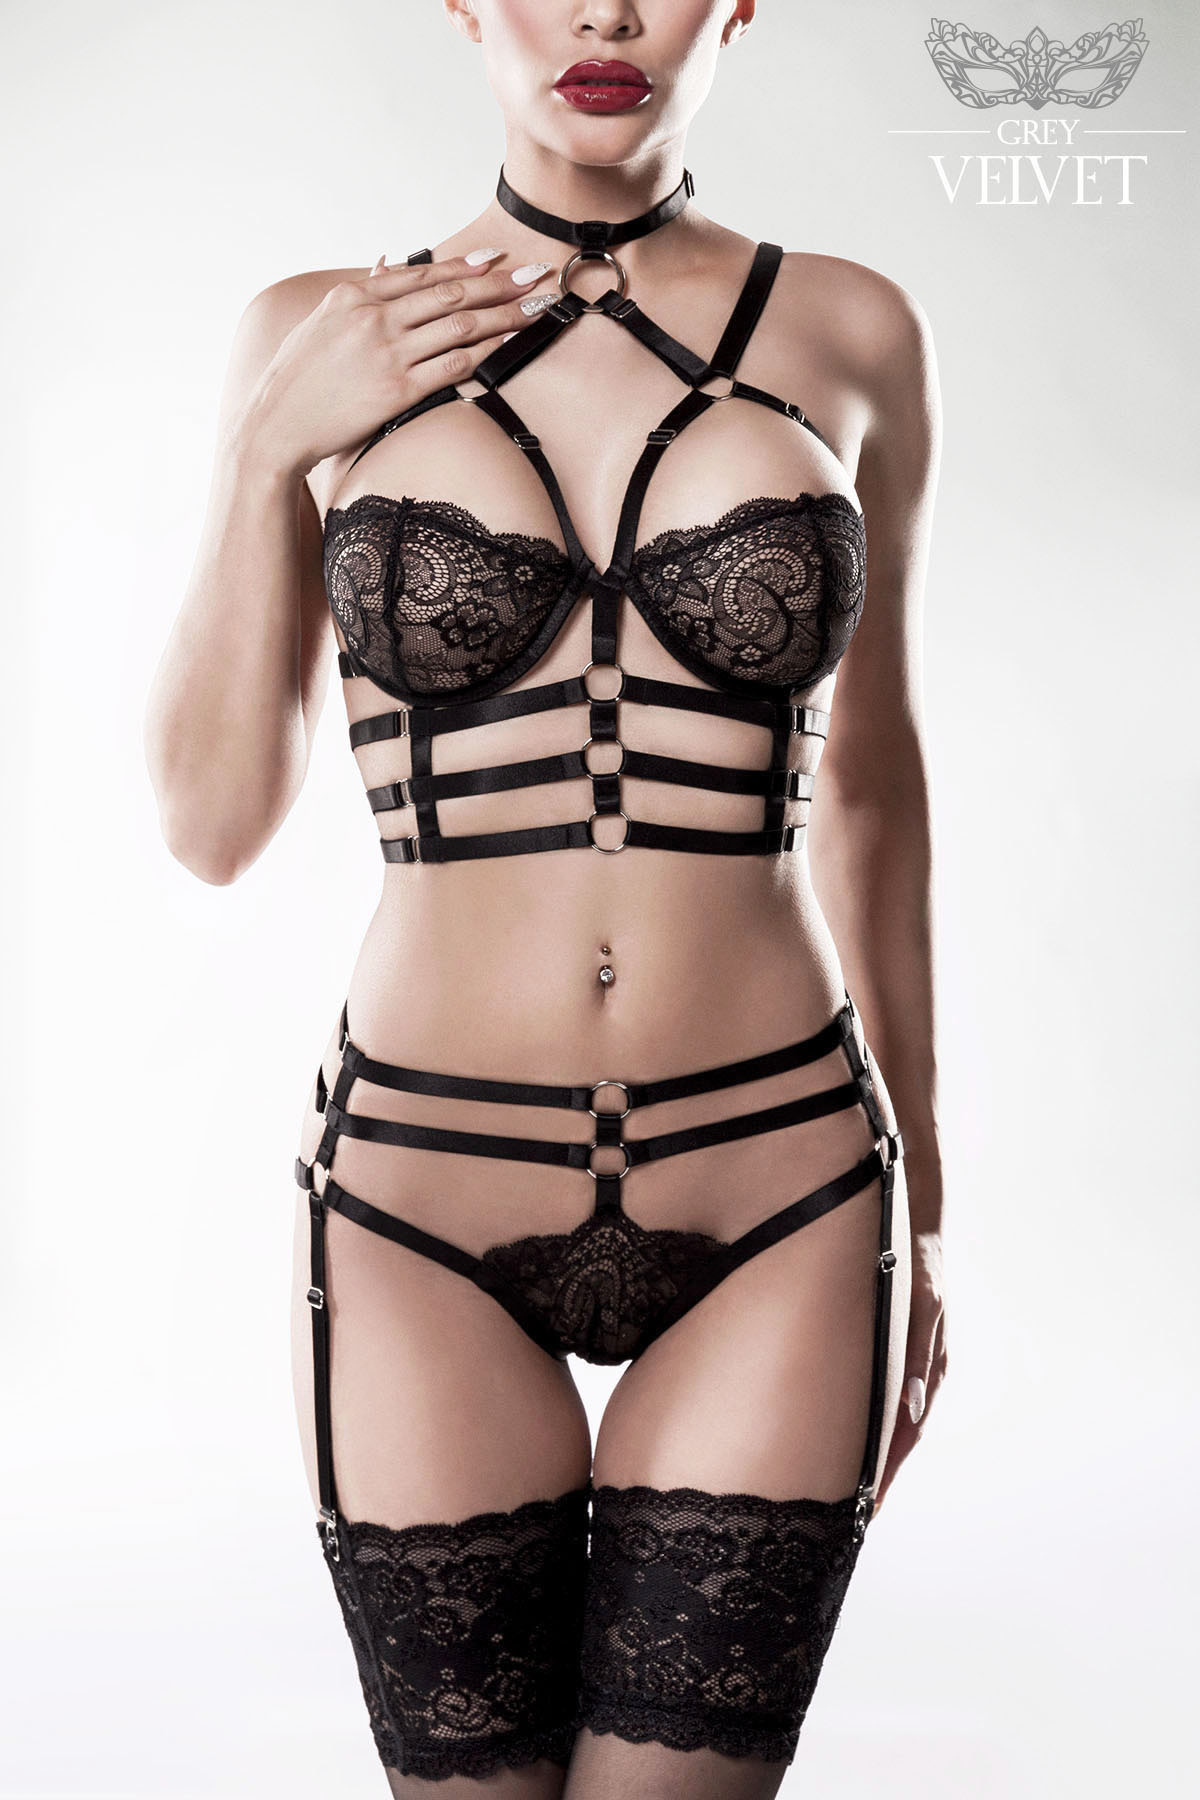 2-piece harness set by Grey Velvet lace: 92% polyamide, 8% elastane, bands: 75% polyamide, 25% elatane bra, panty